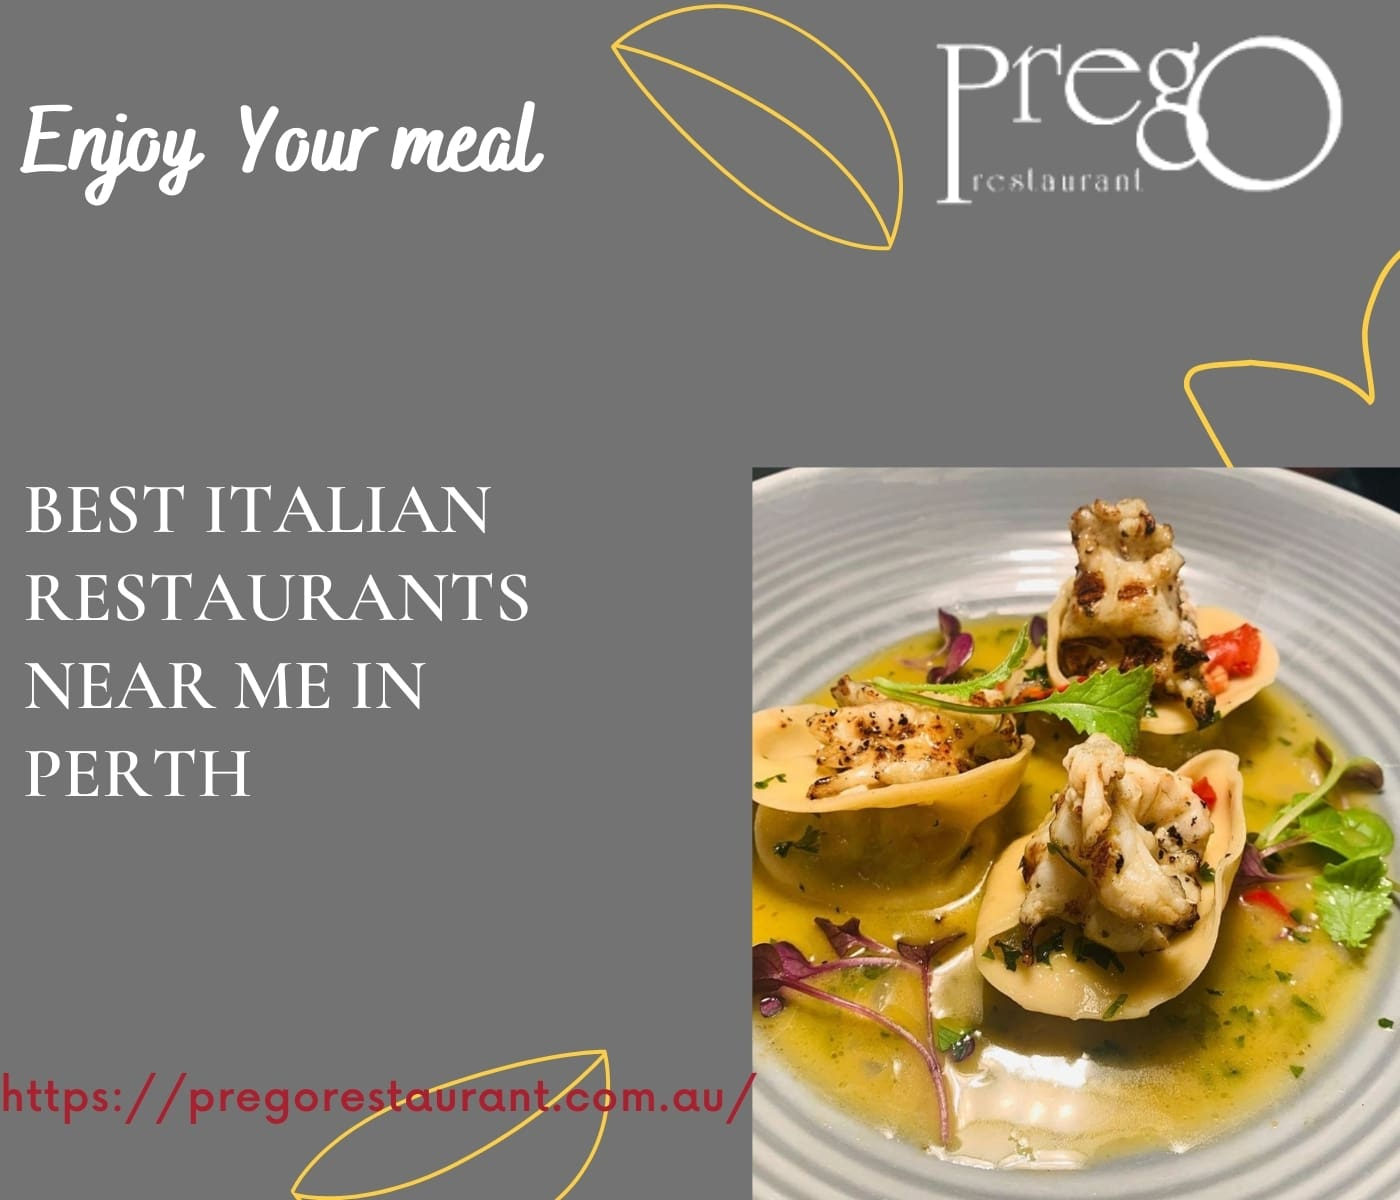 Best Italian Restaurants near me in Perth